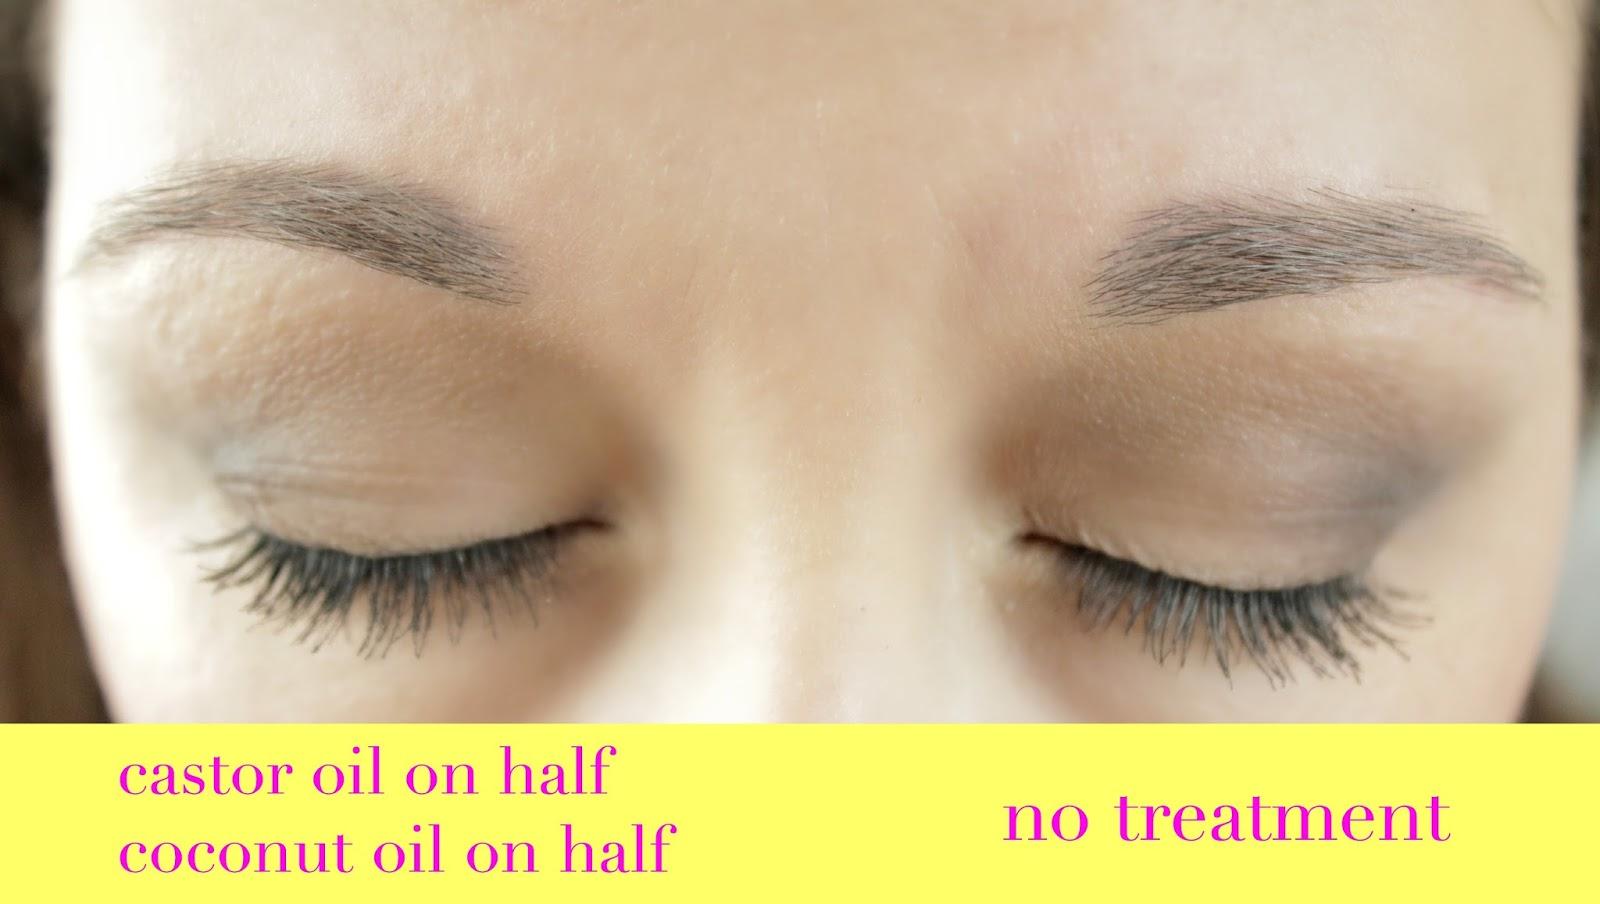 elle sees|| beauty blogger in atlanta: 5 mascara hacks: do they work?